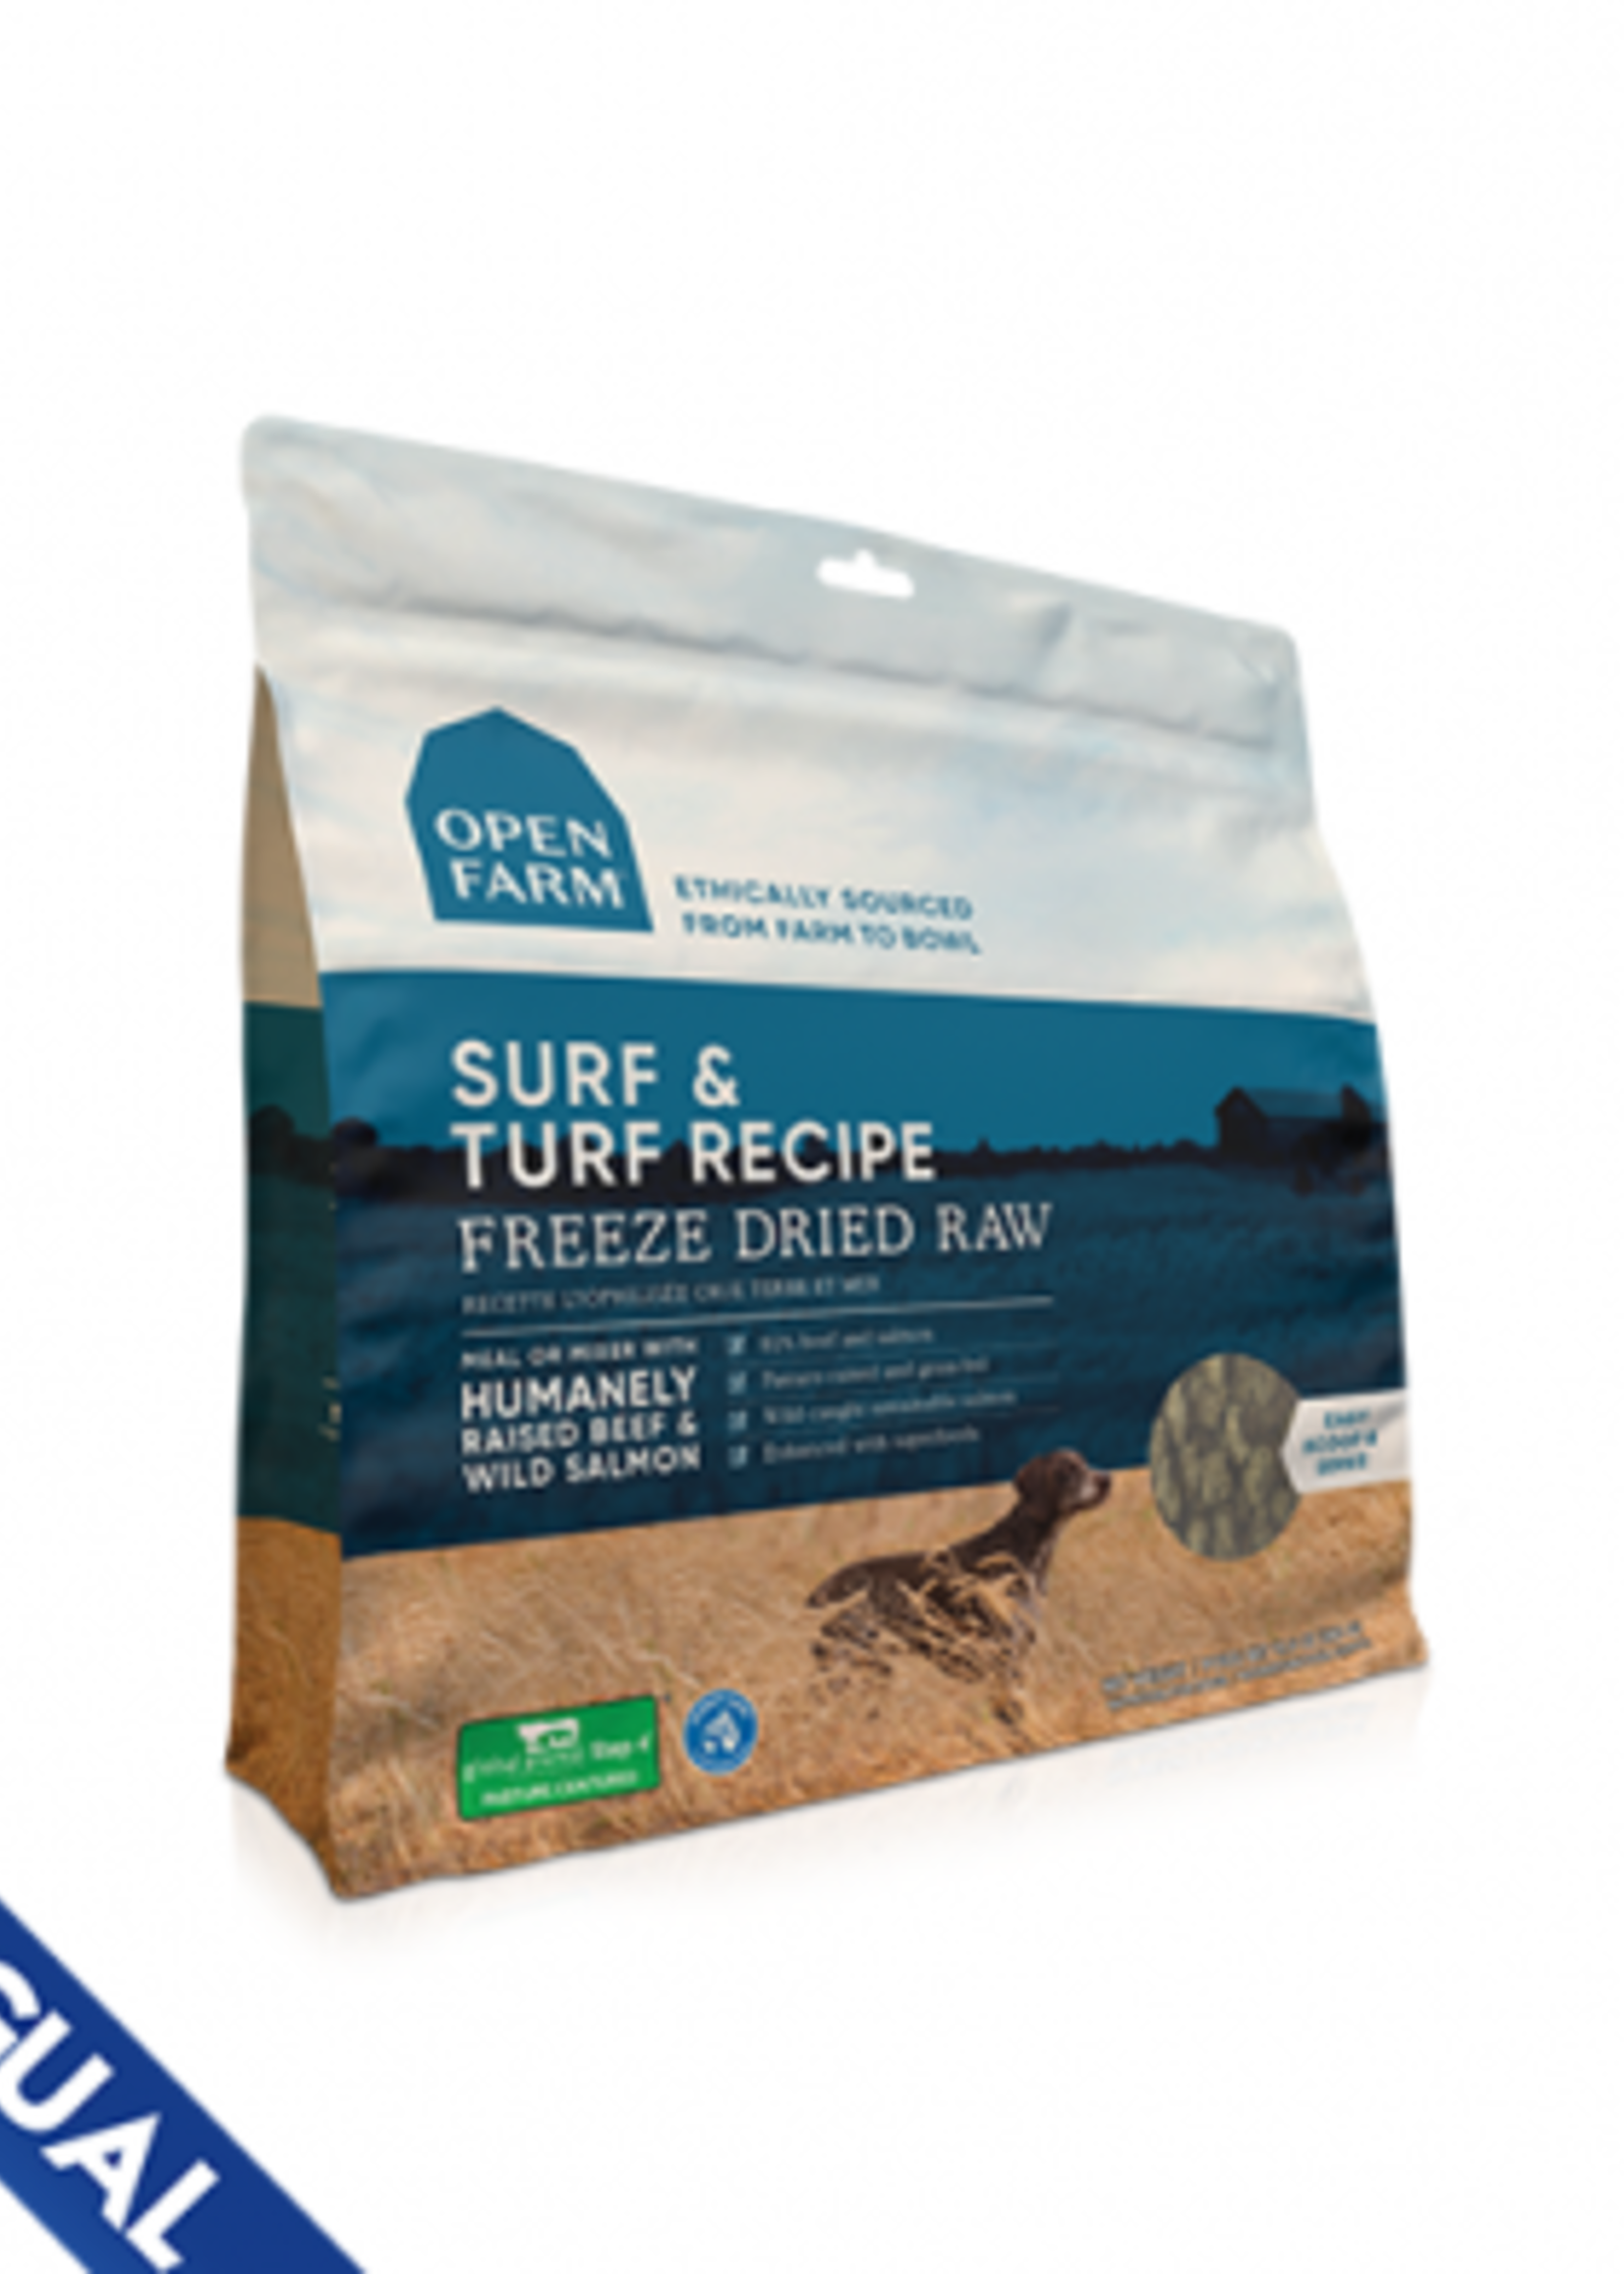 Open Farm® Open Farm Surf & Turf Freeze Dried Raw 13.5oz